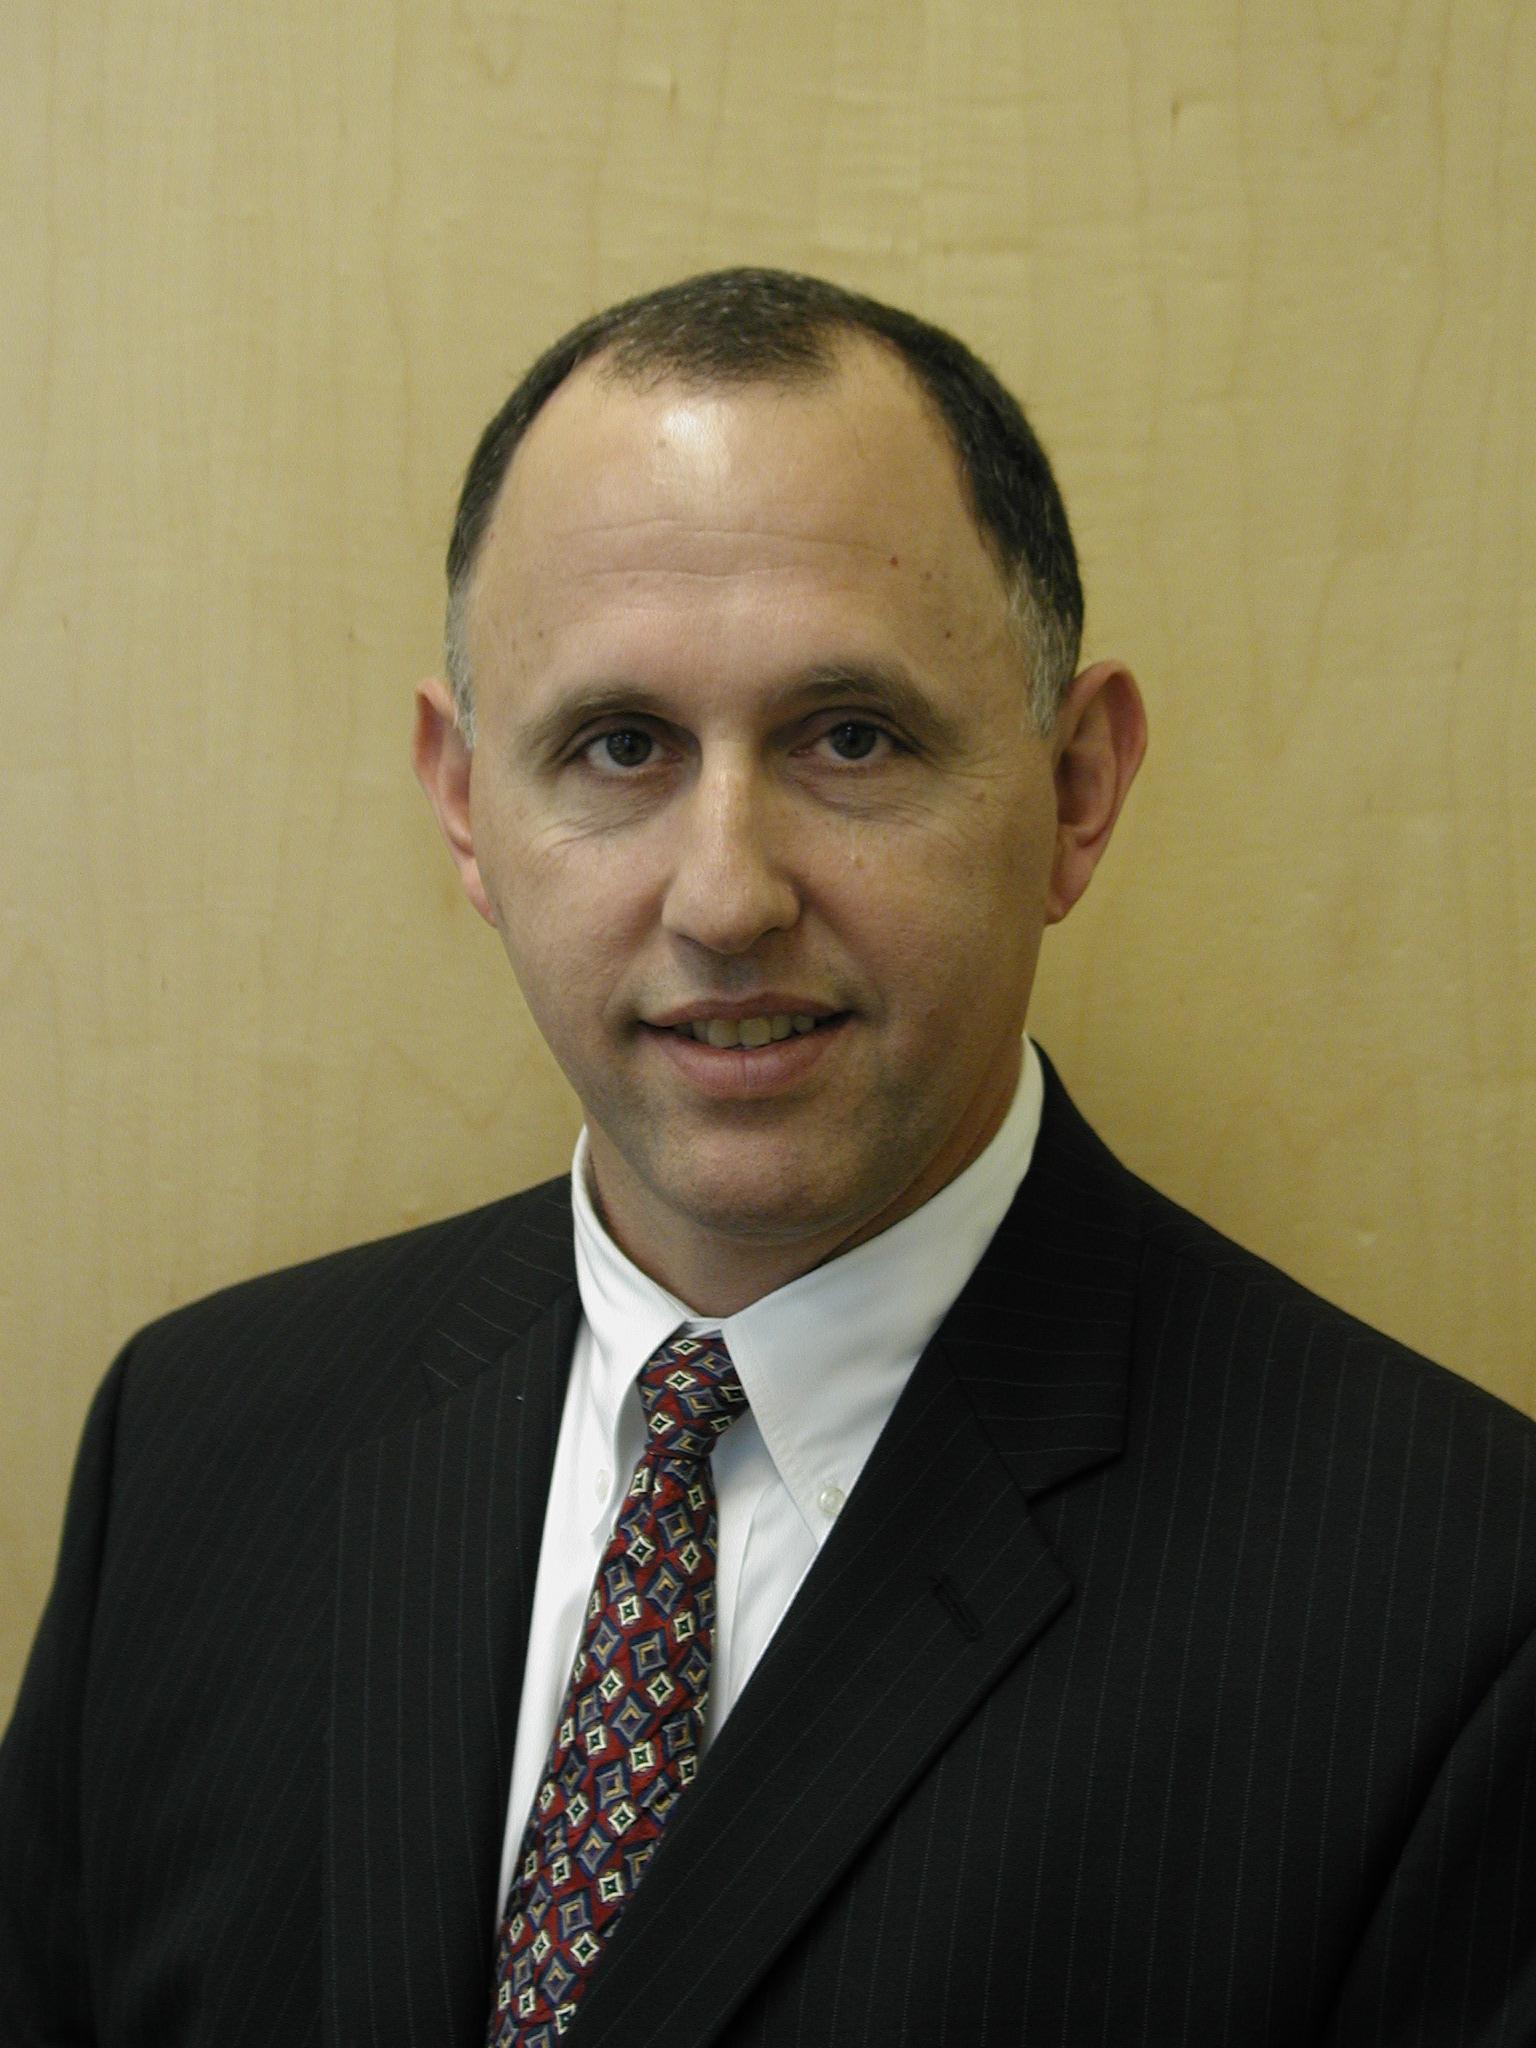 Michael Balikian